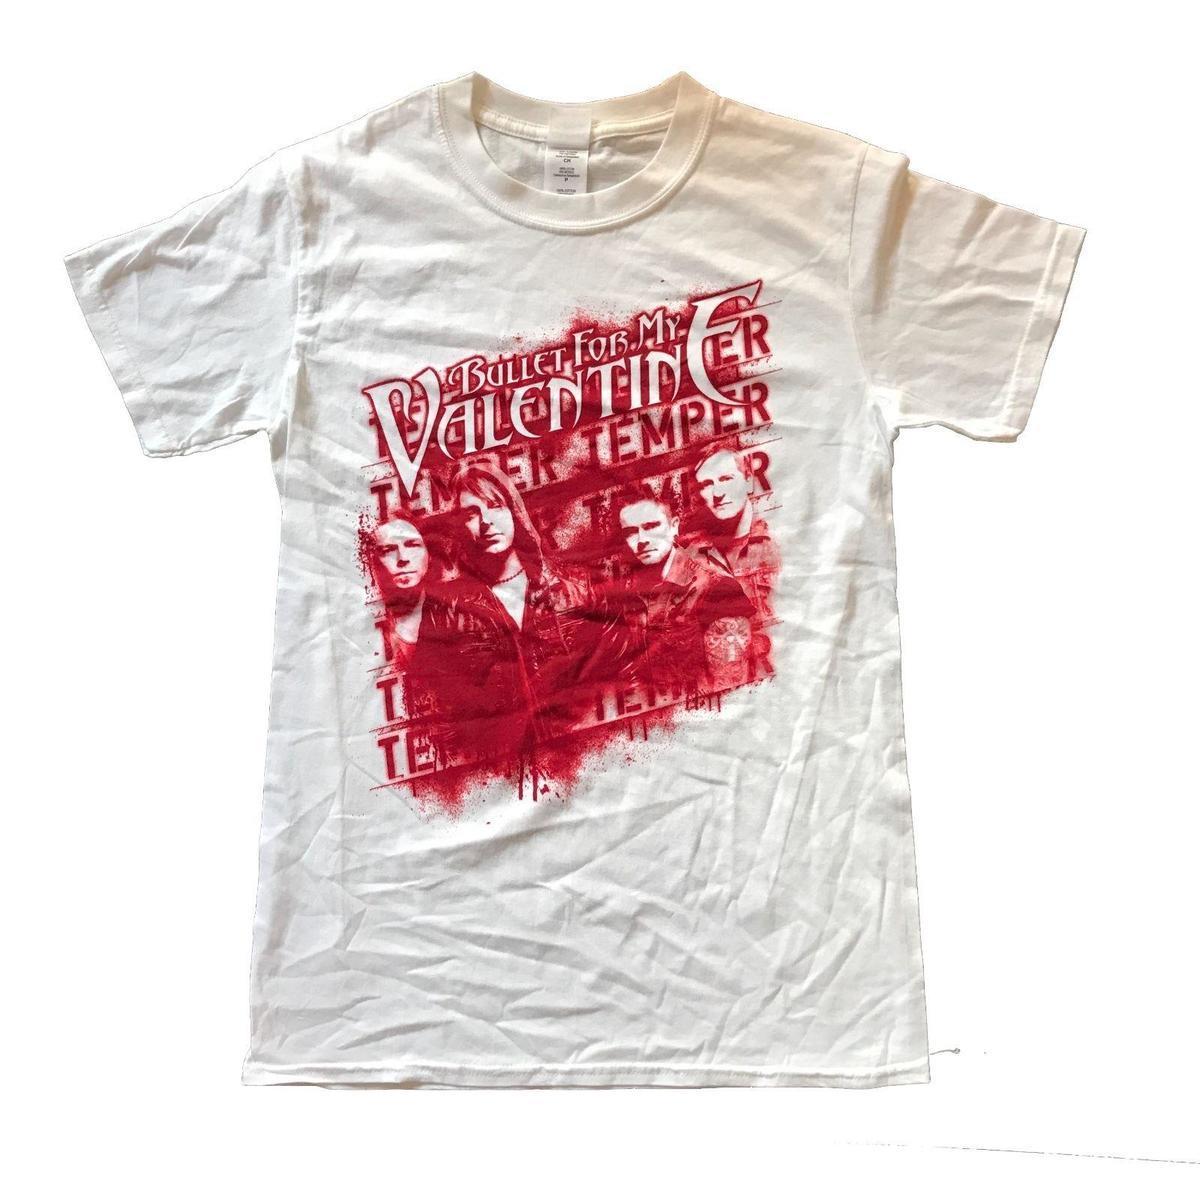 Großhandel Bullet For My Valentine Temper Temper Camiseta Oficial